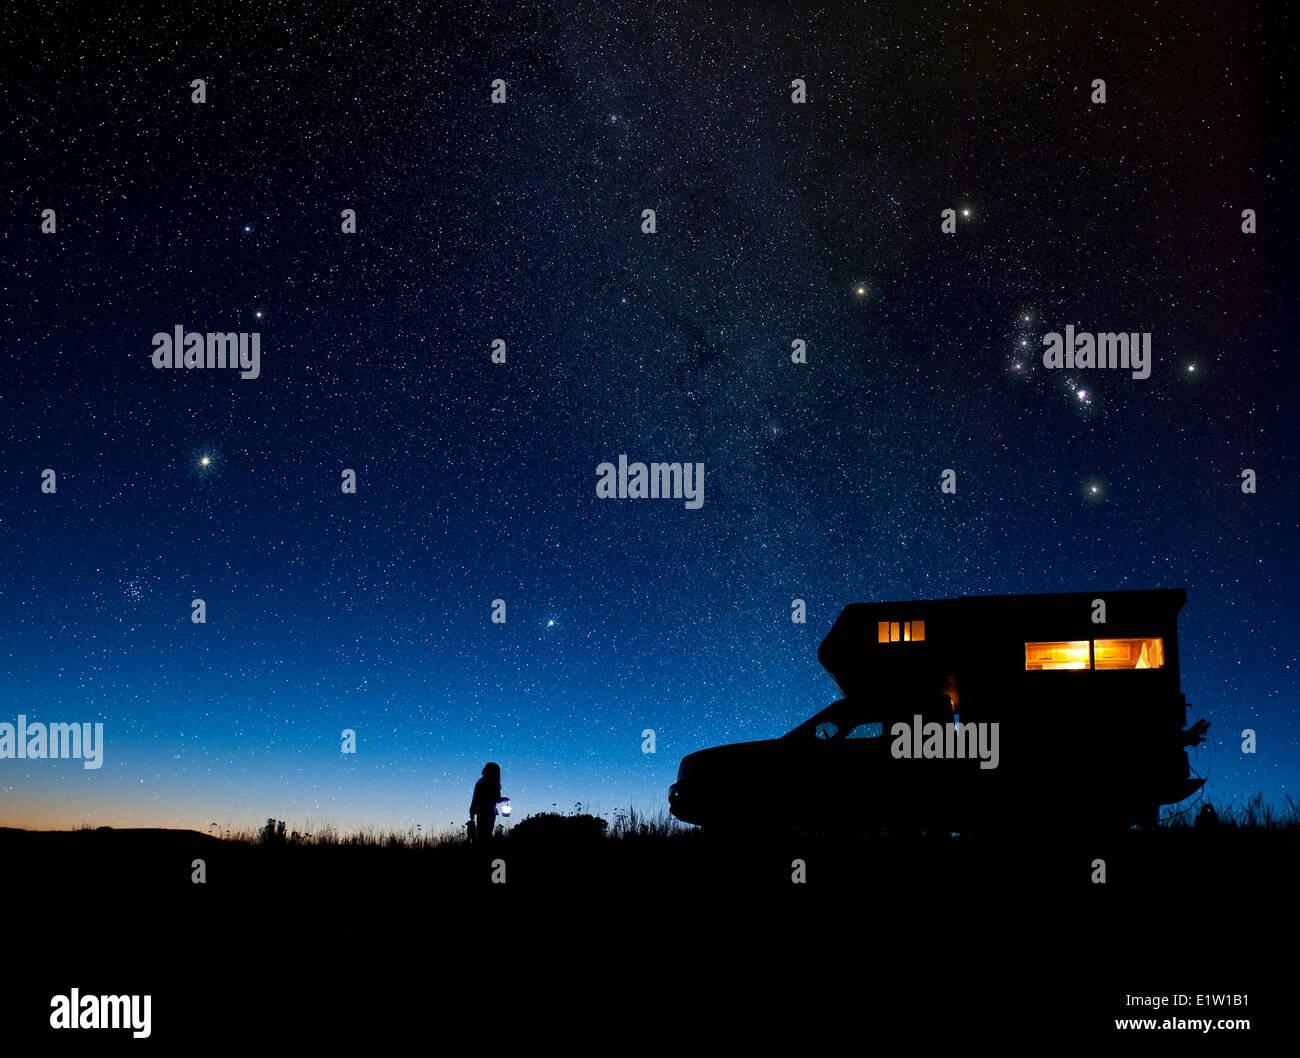 Child and camper under starry sky. Okanagan area, British Columbia, Canada - Stock Image